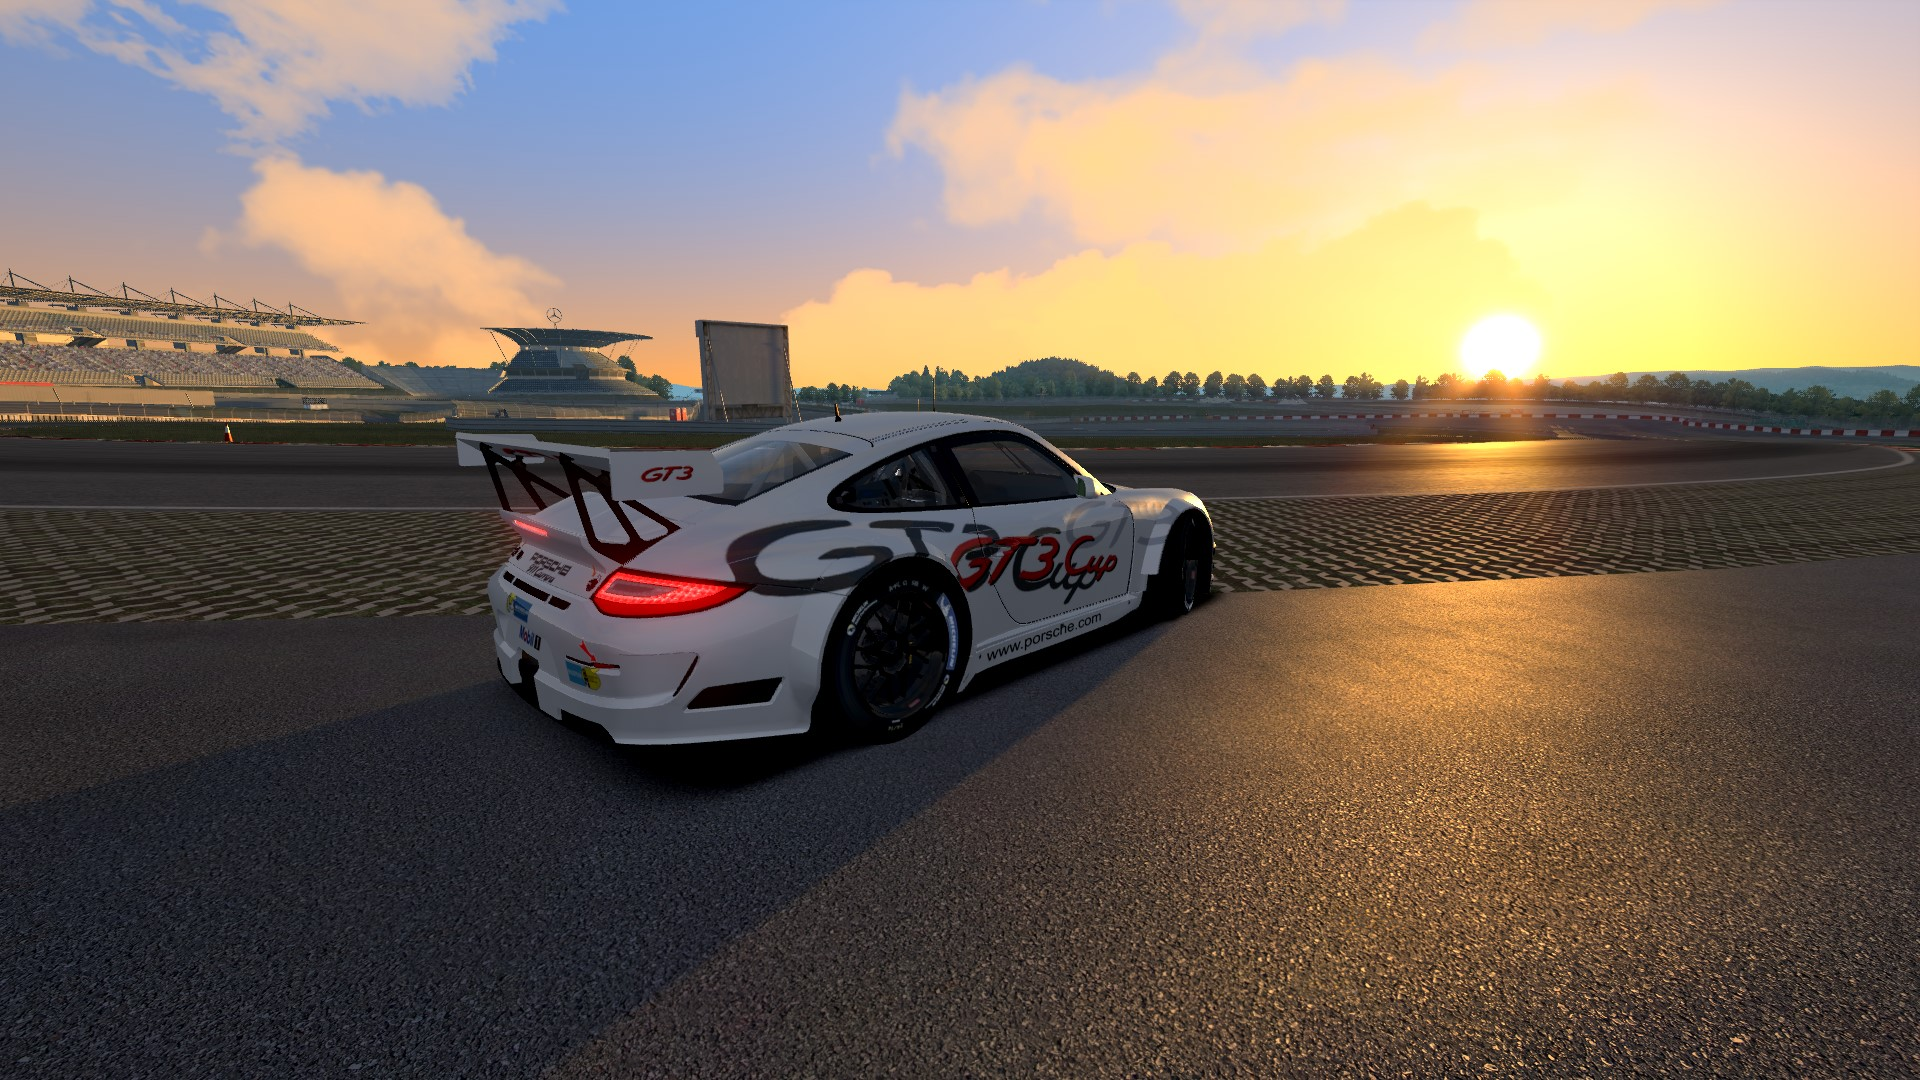 Screenshot_porsche_997gt3rsr_nurburgring_11-2-2015-22-59-3.jpg